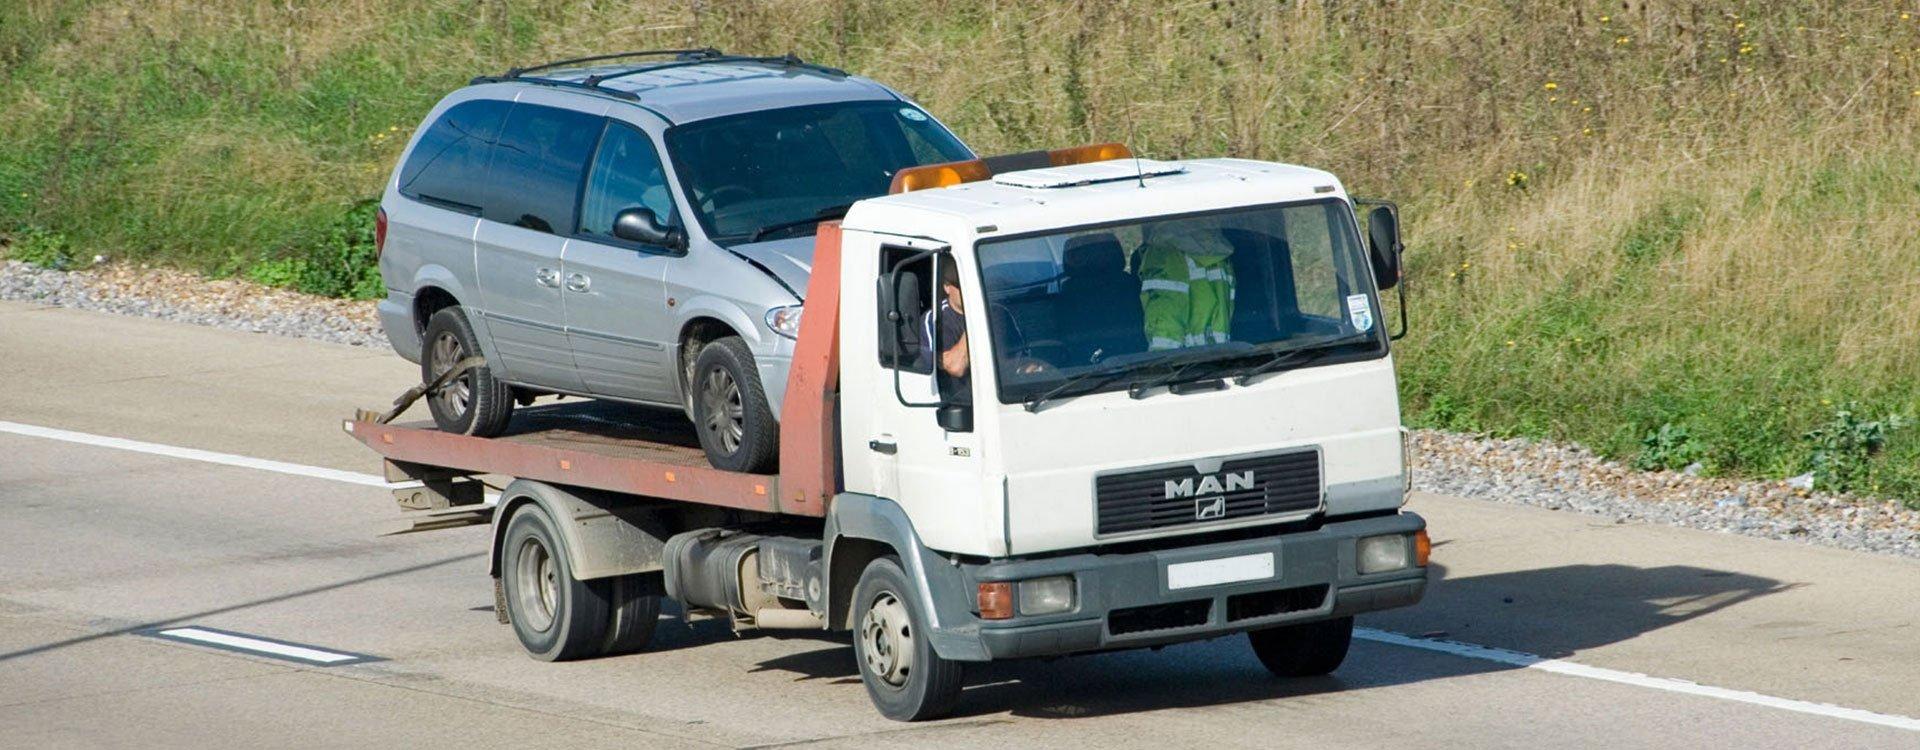 Croydon breakdown recovery services